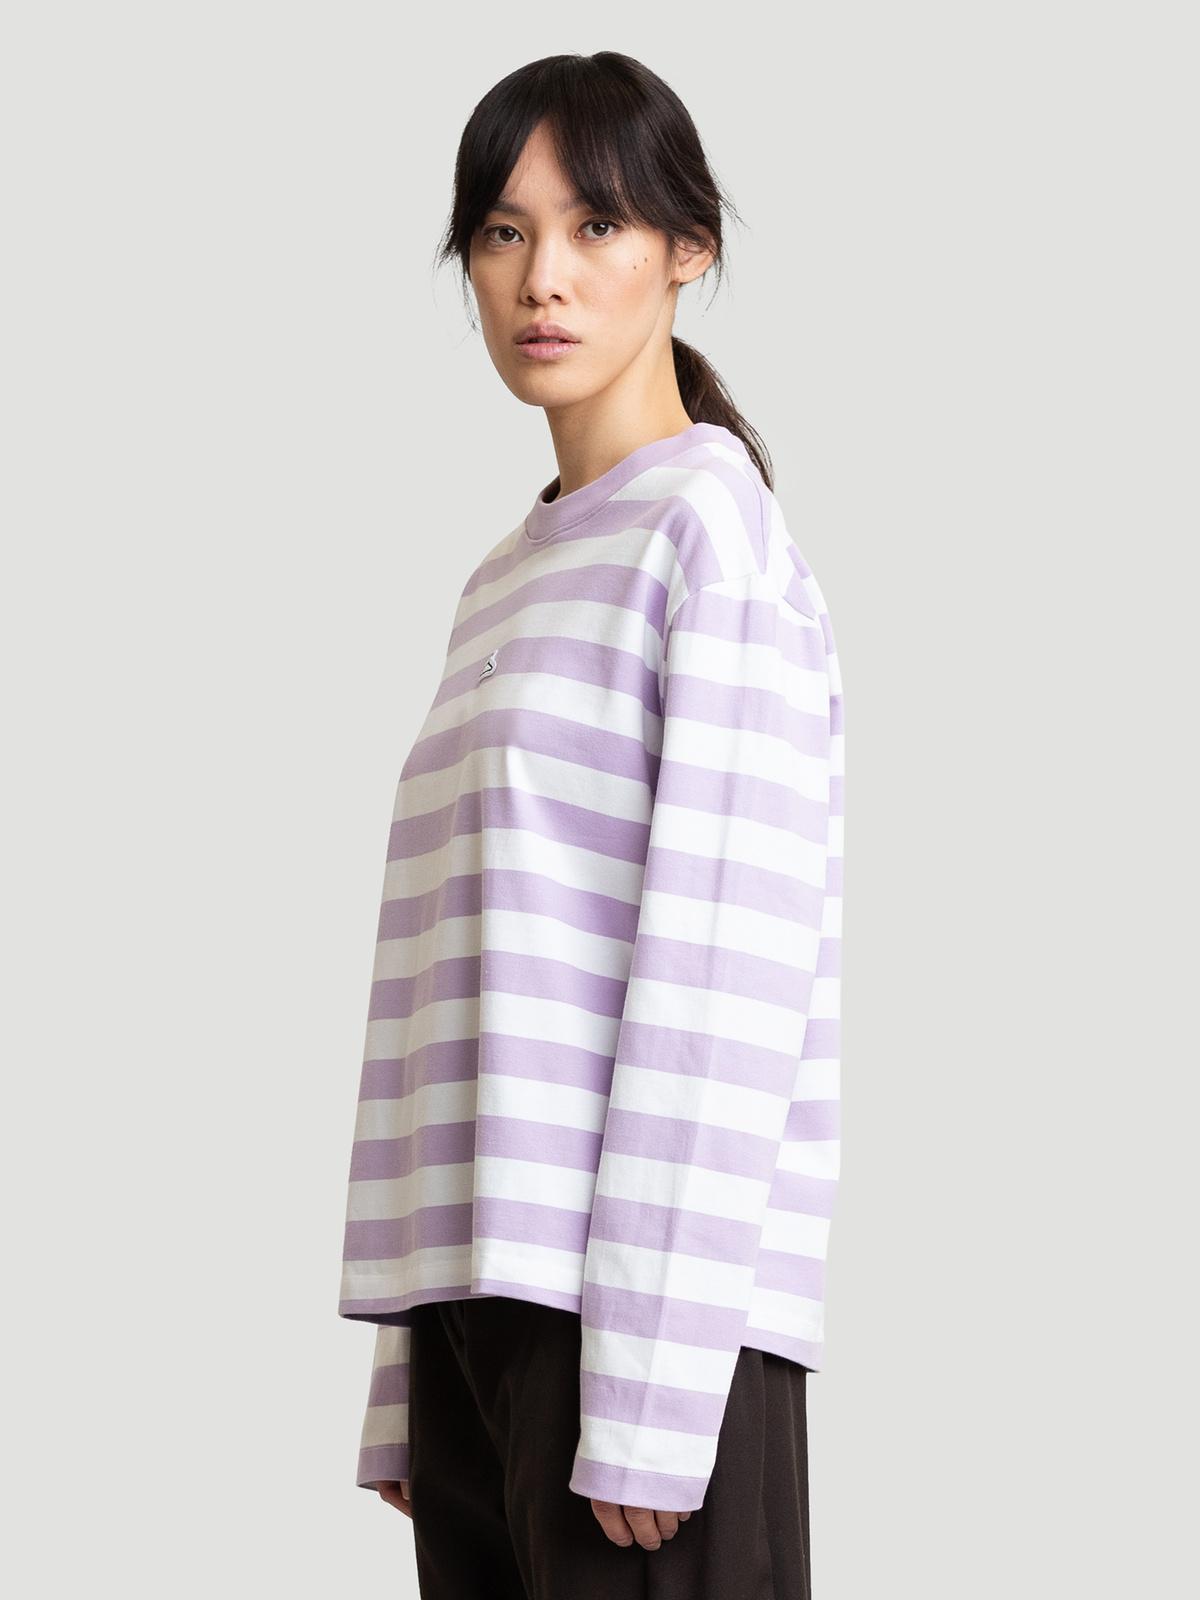 Hanger Striped Longsleeve Lilac White 7